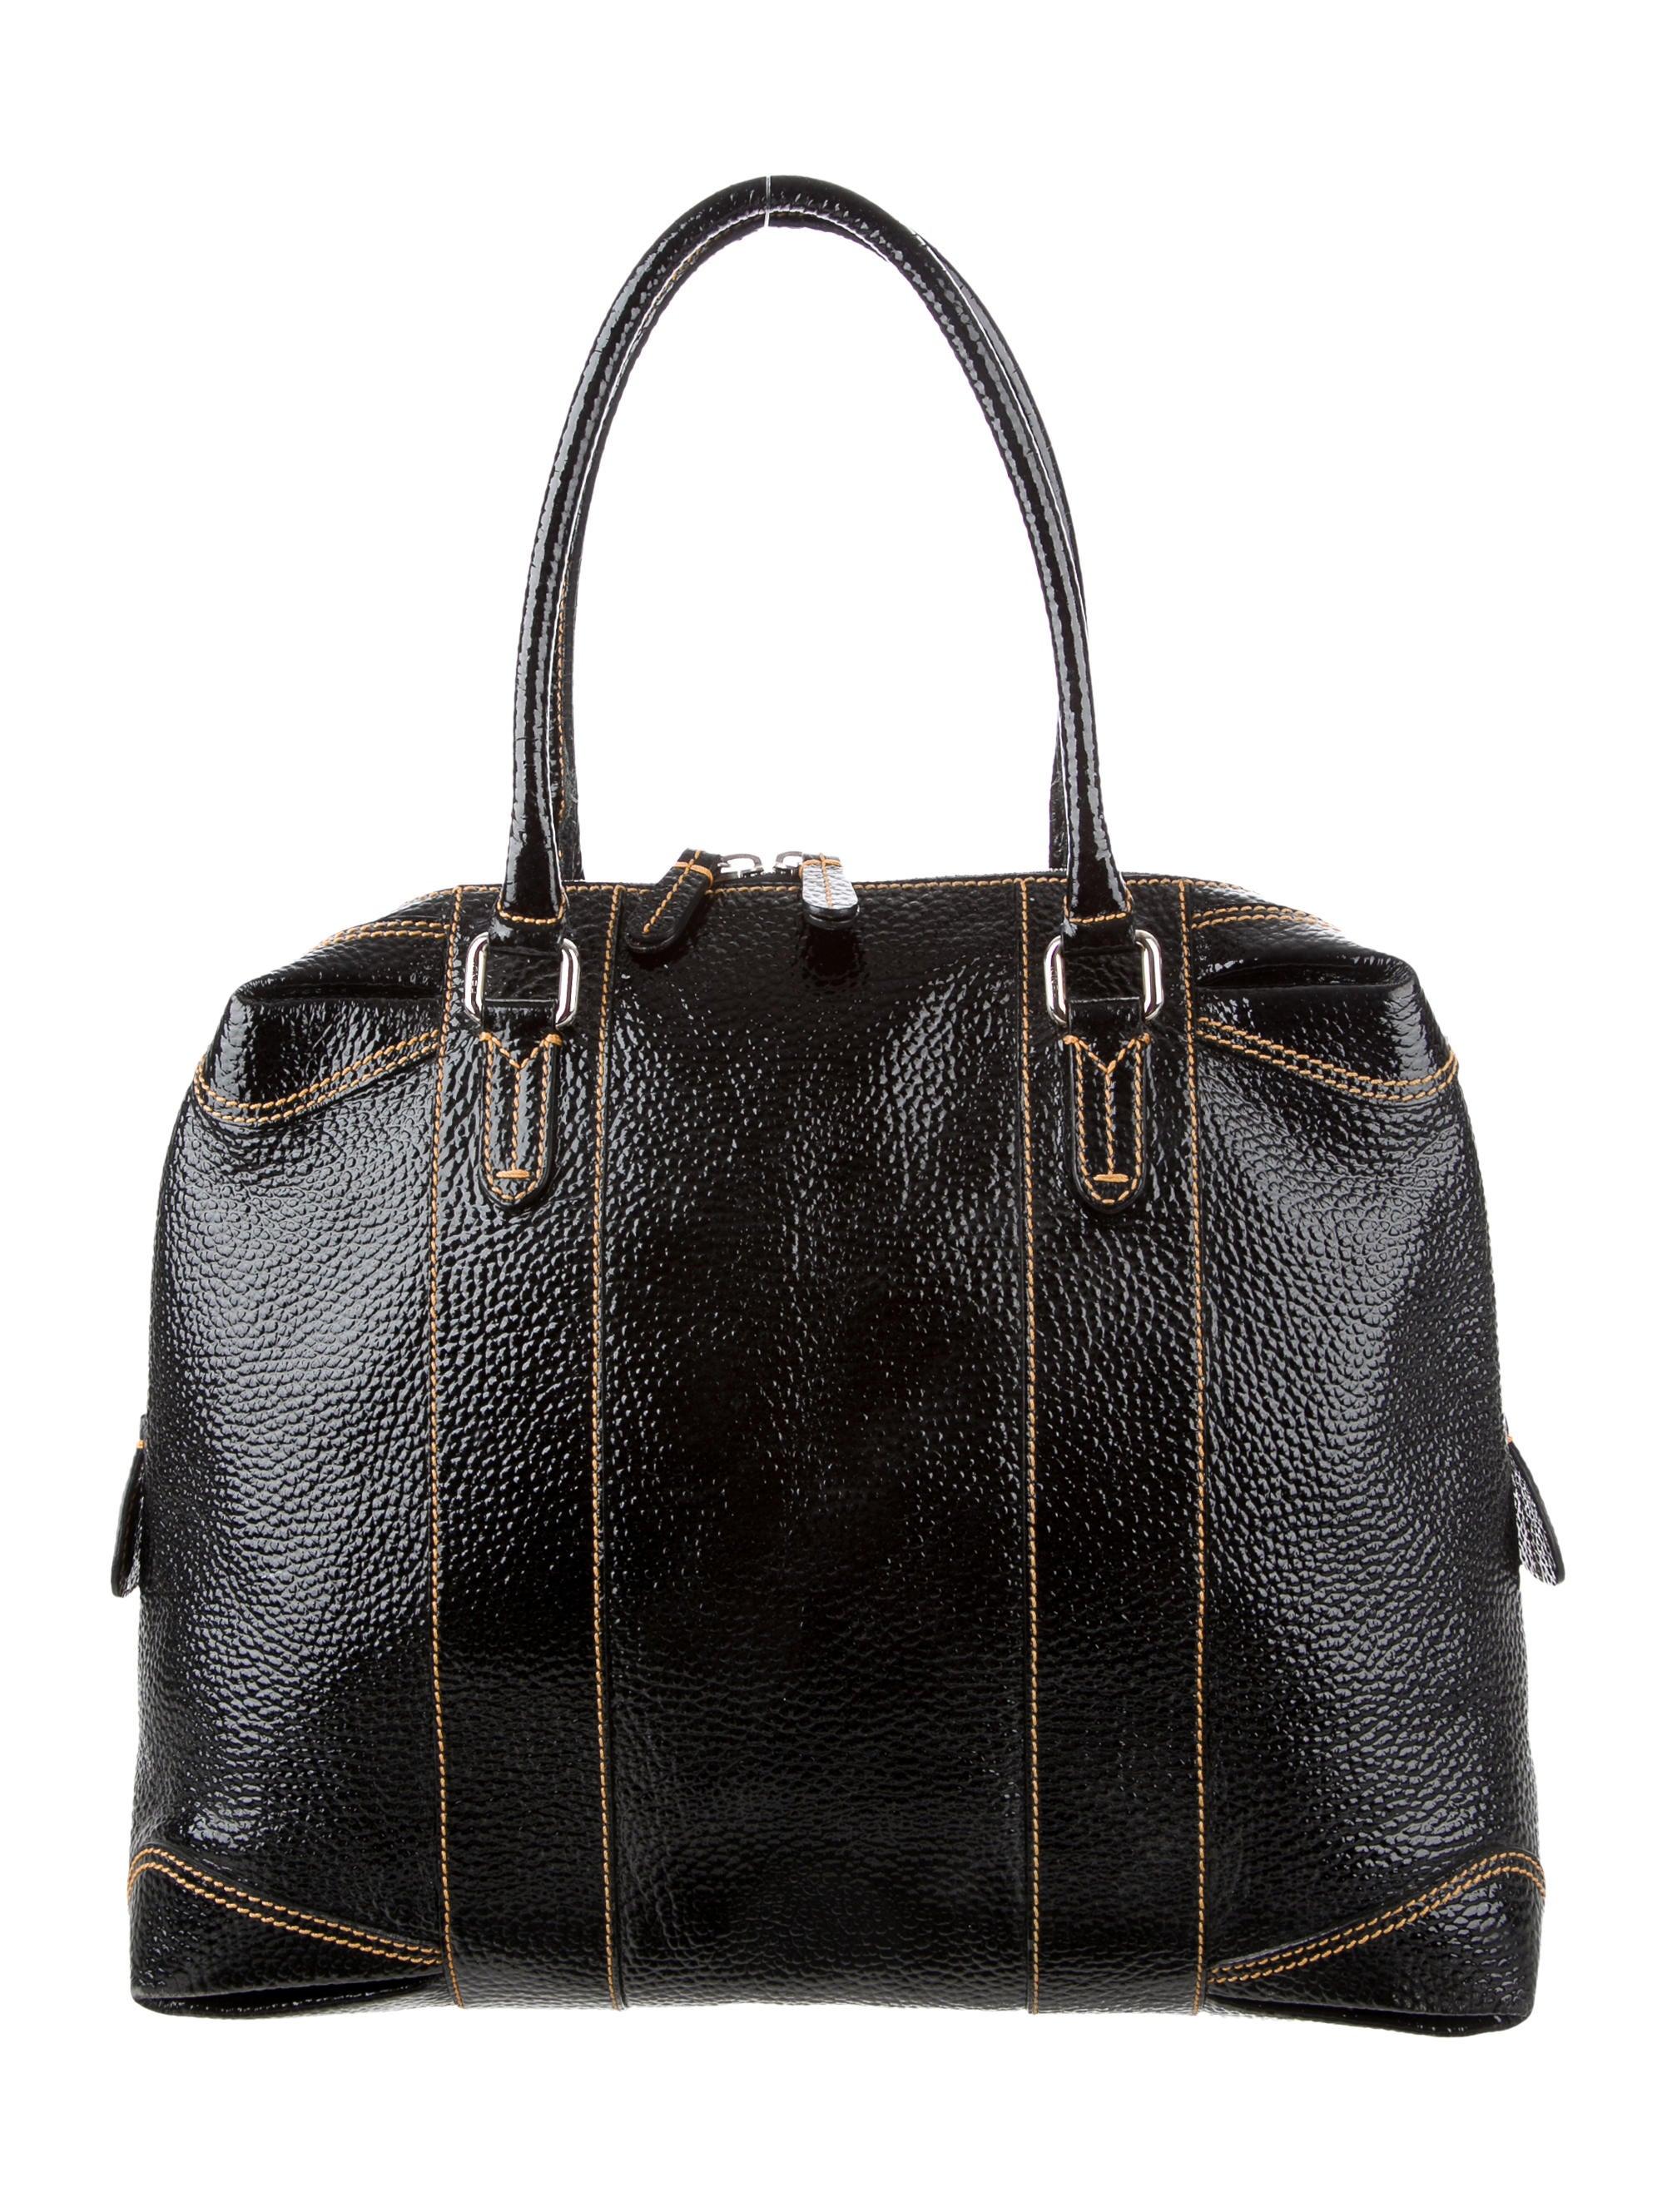 fendi textured leather bag handbags fen53856 the With fendi letter bag